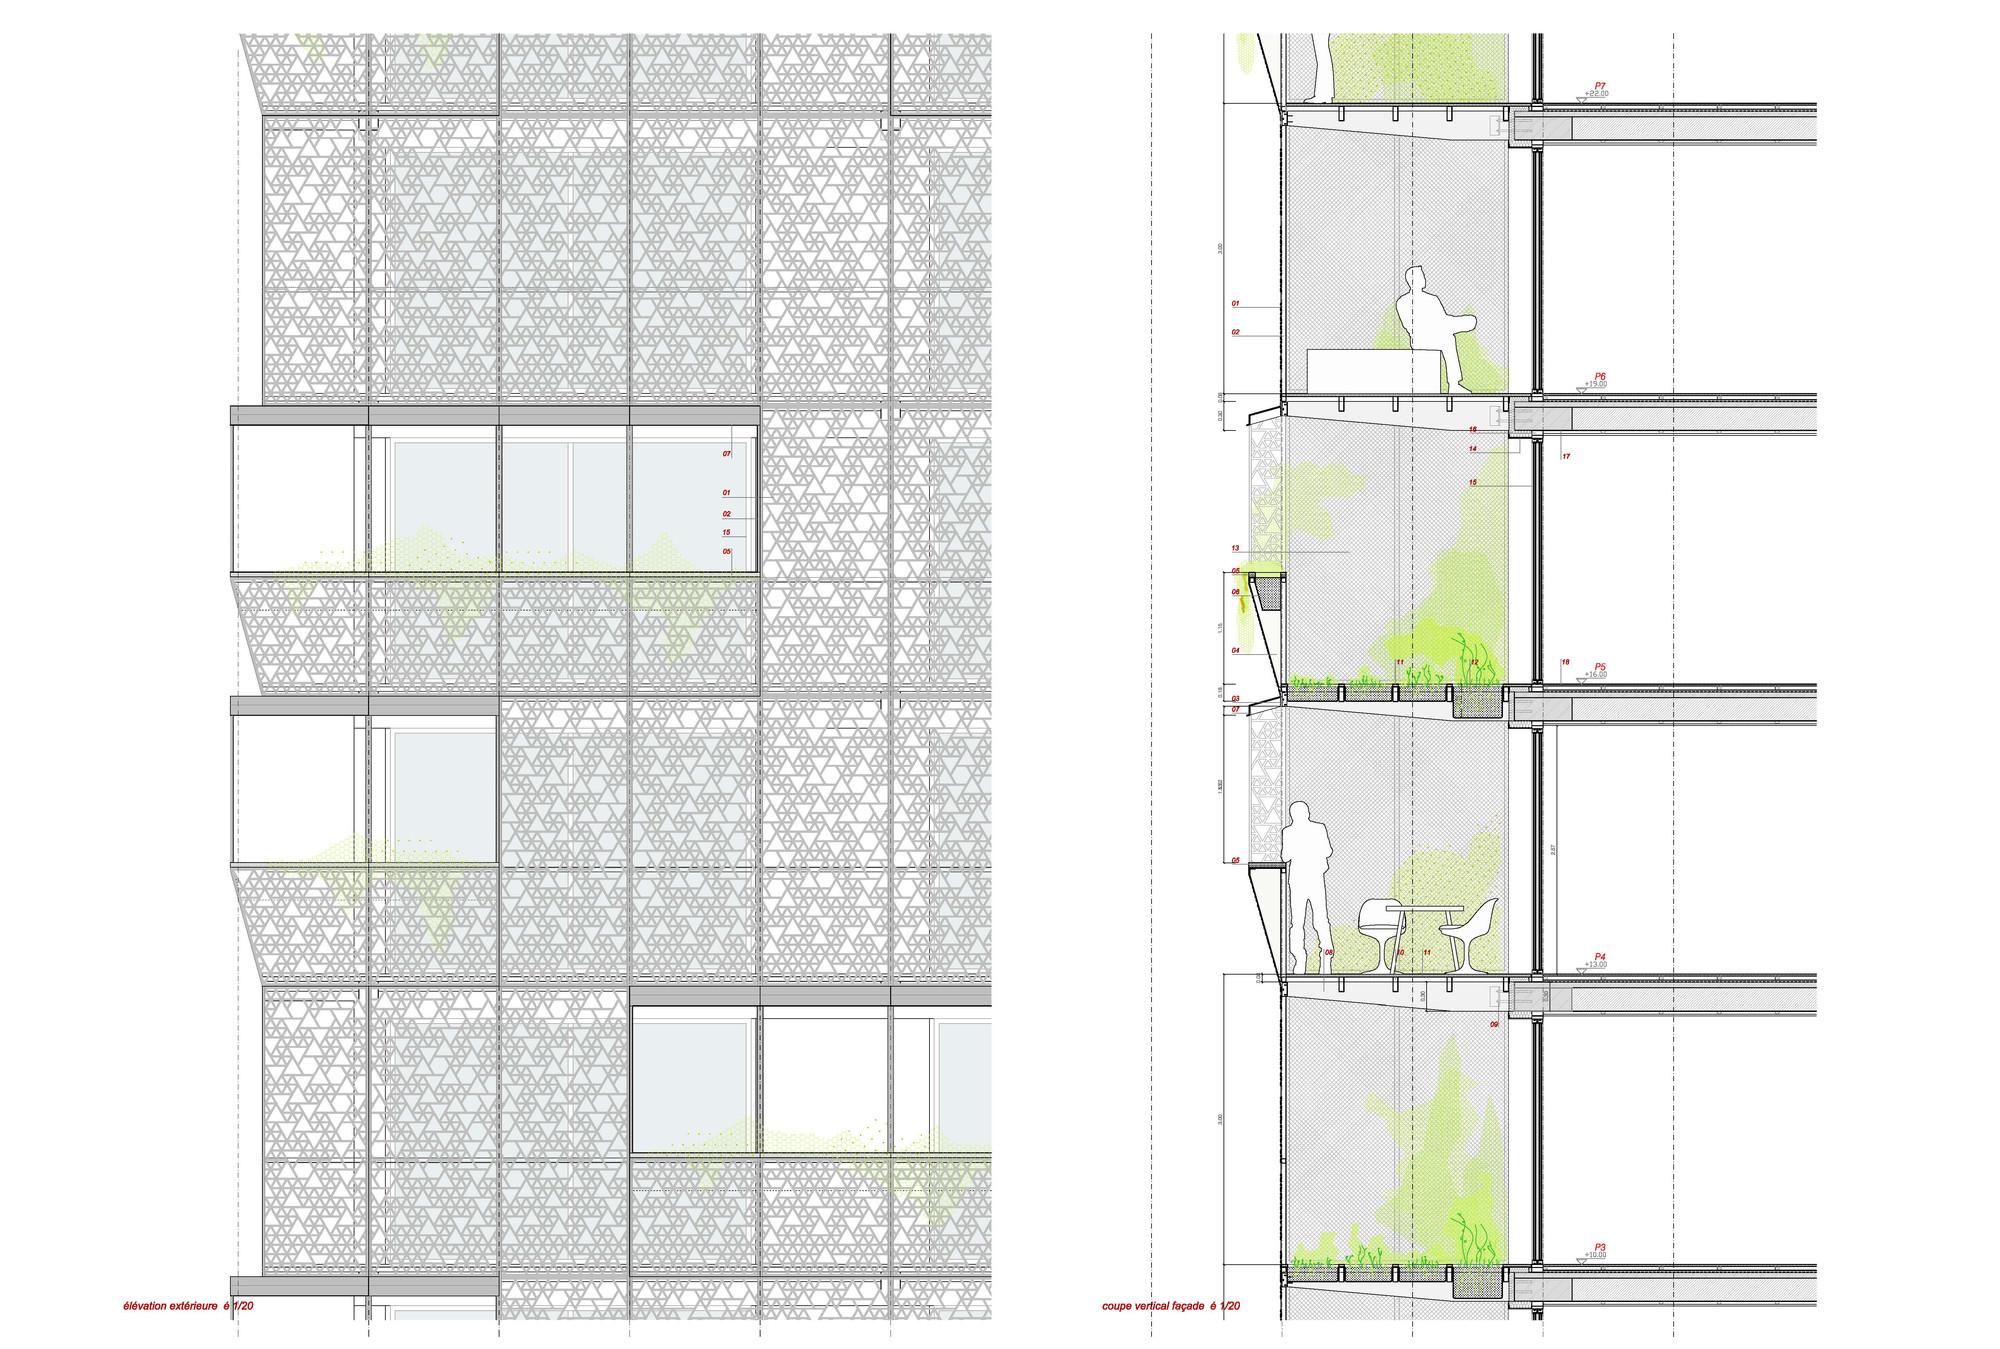 Sistema de Fachadas. Image Courtesy of Herreros Arquitectos